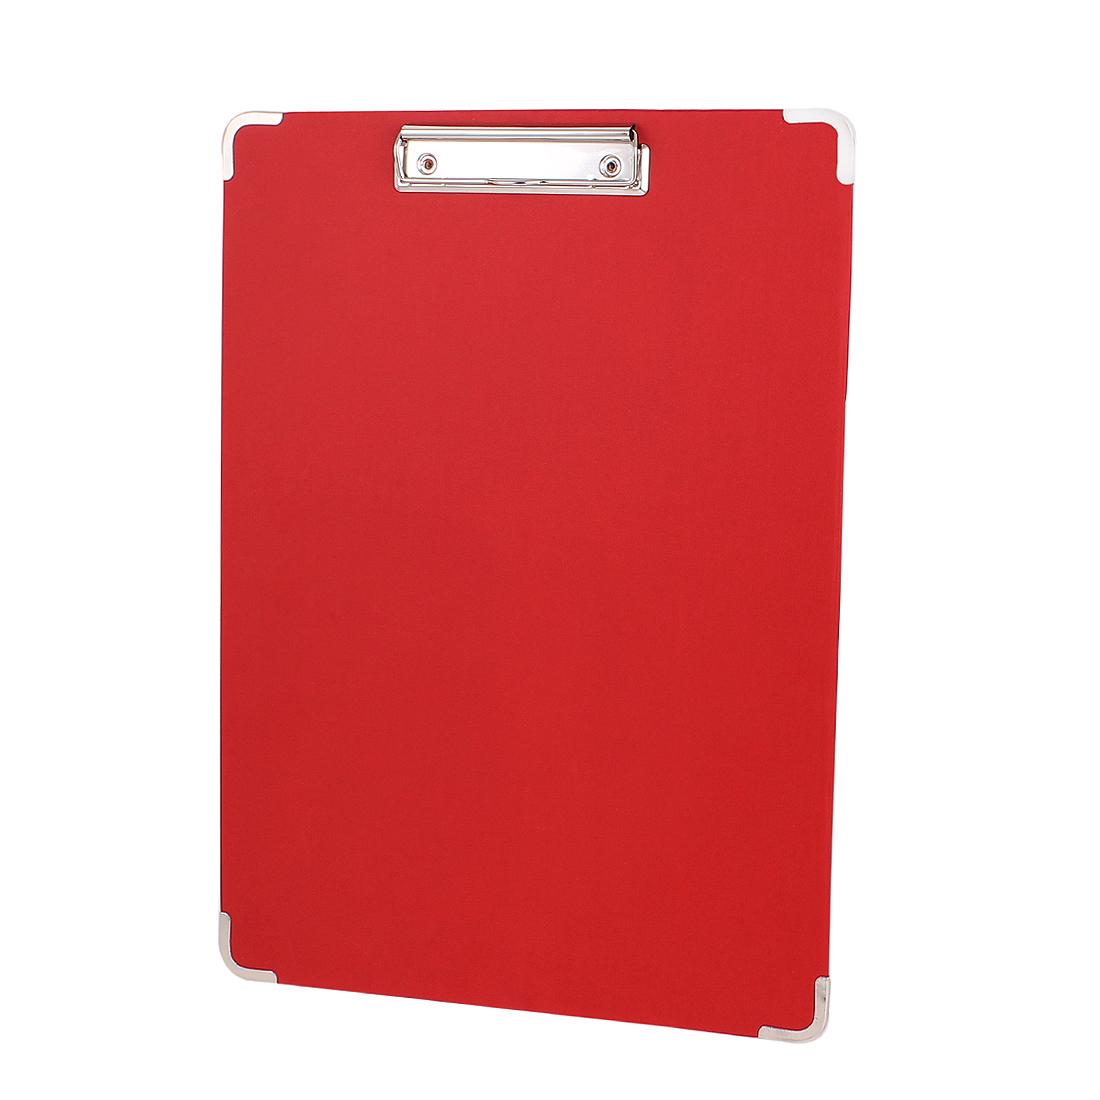 40cmx28cm Painting Art Sketch Board Holder Hardboard Clipboard Red w Low Clip